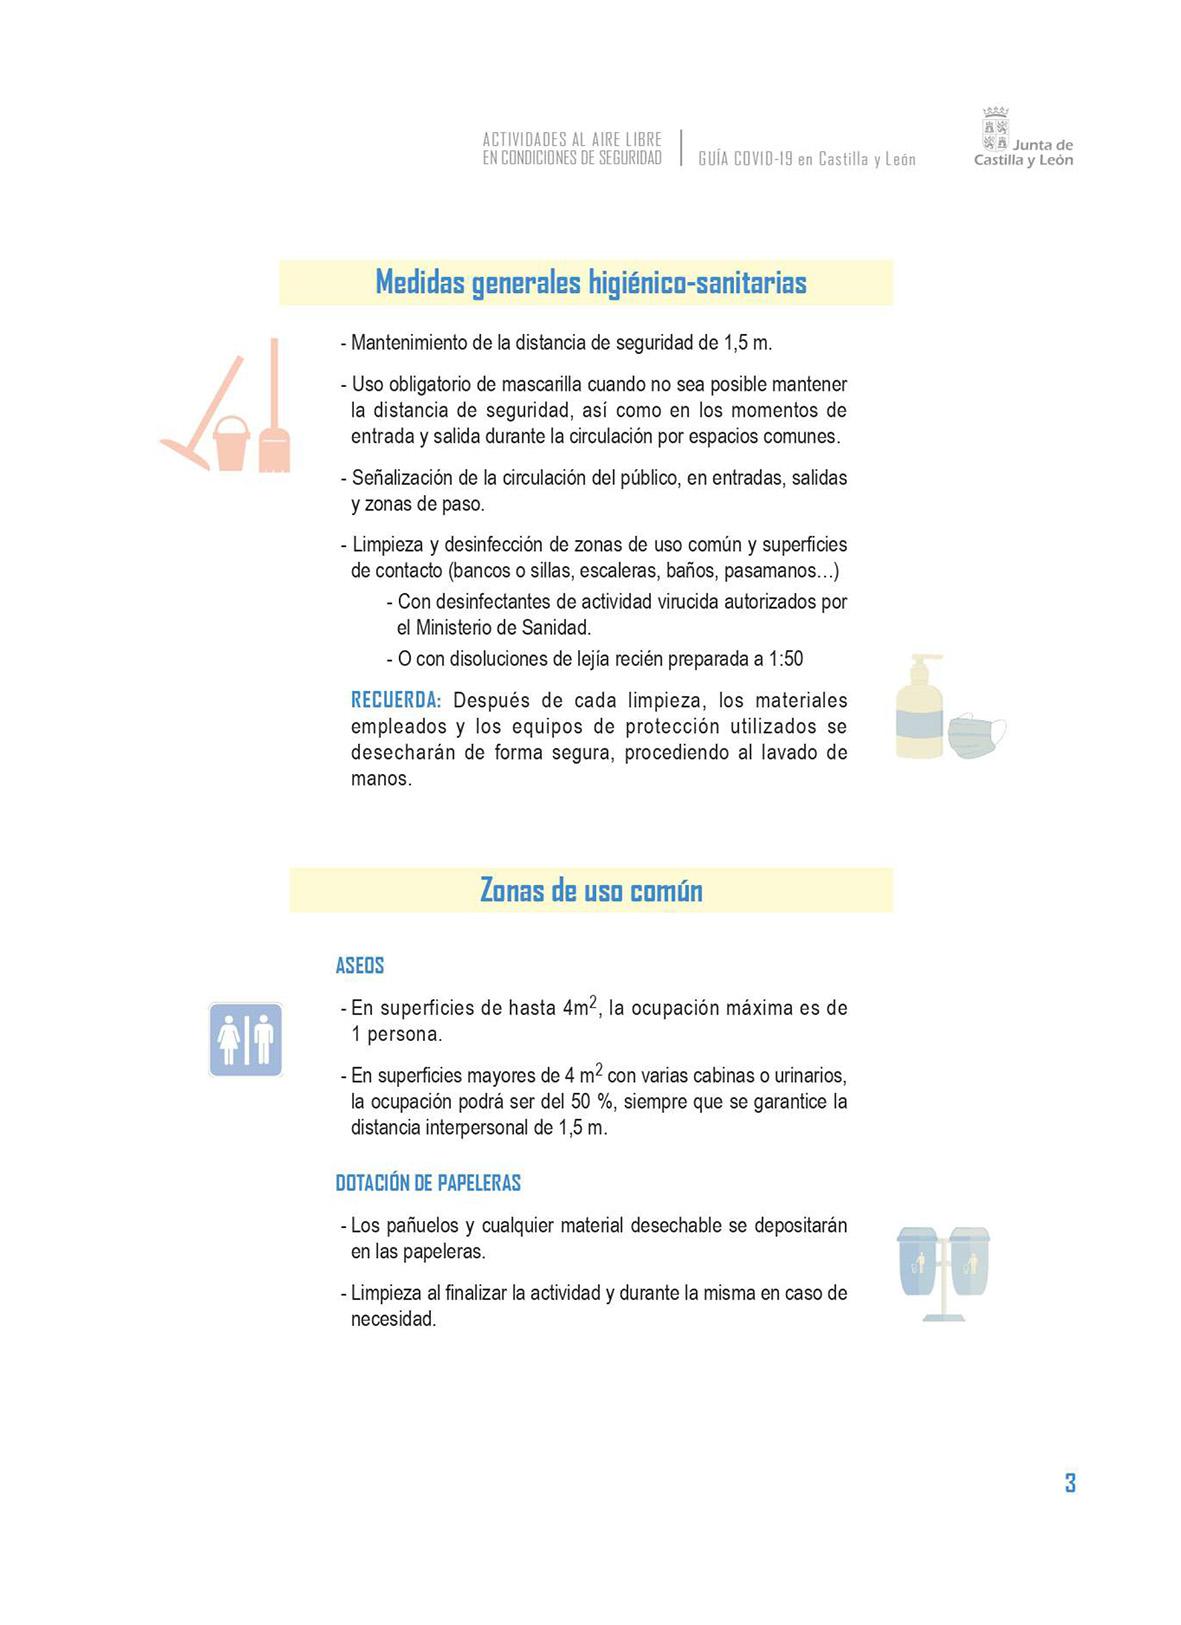 Guia Actividades Aire Libre - JCyL - TiétarTeVe